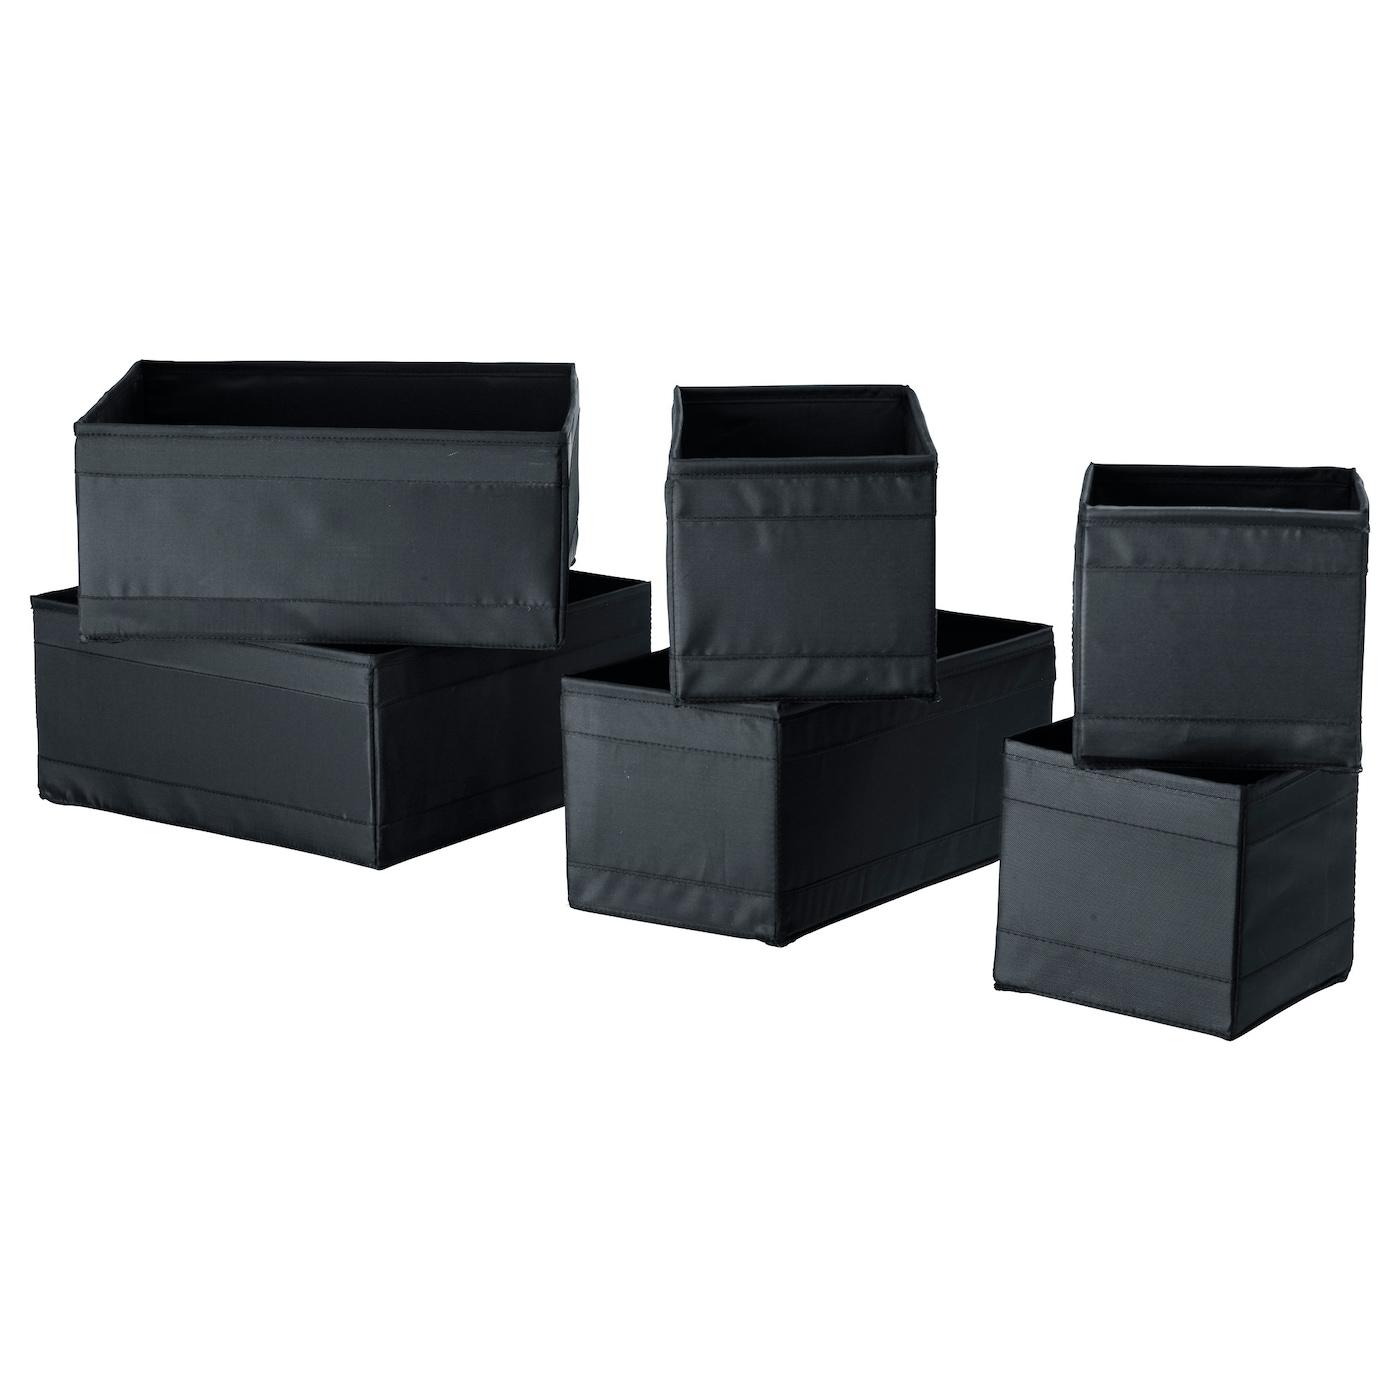 Ikea Skubb Box Set Of 6